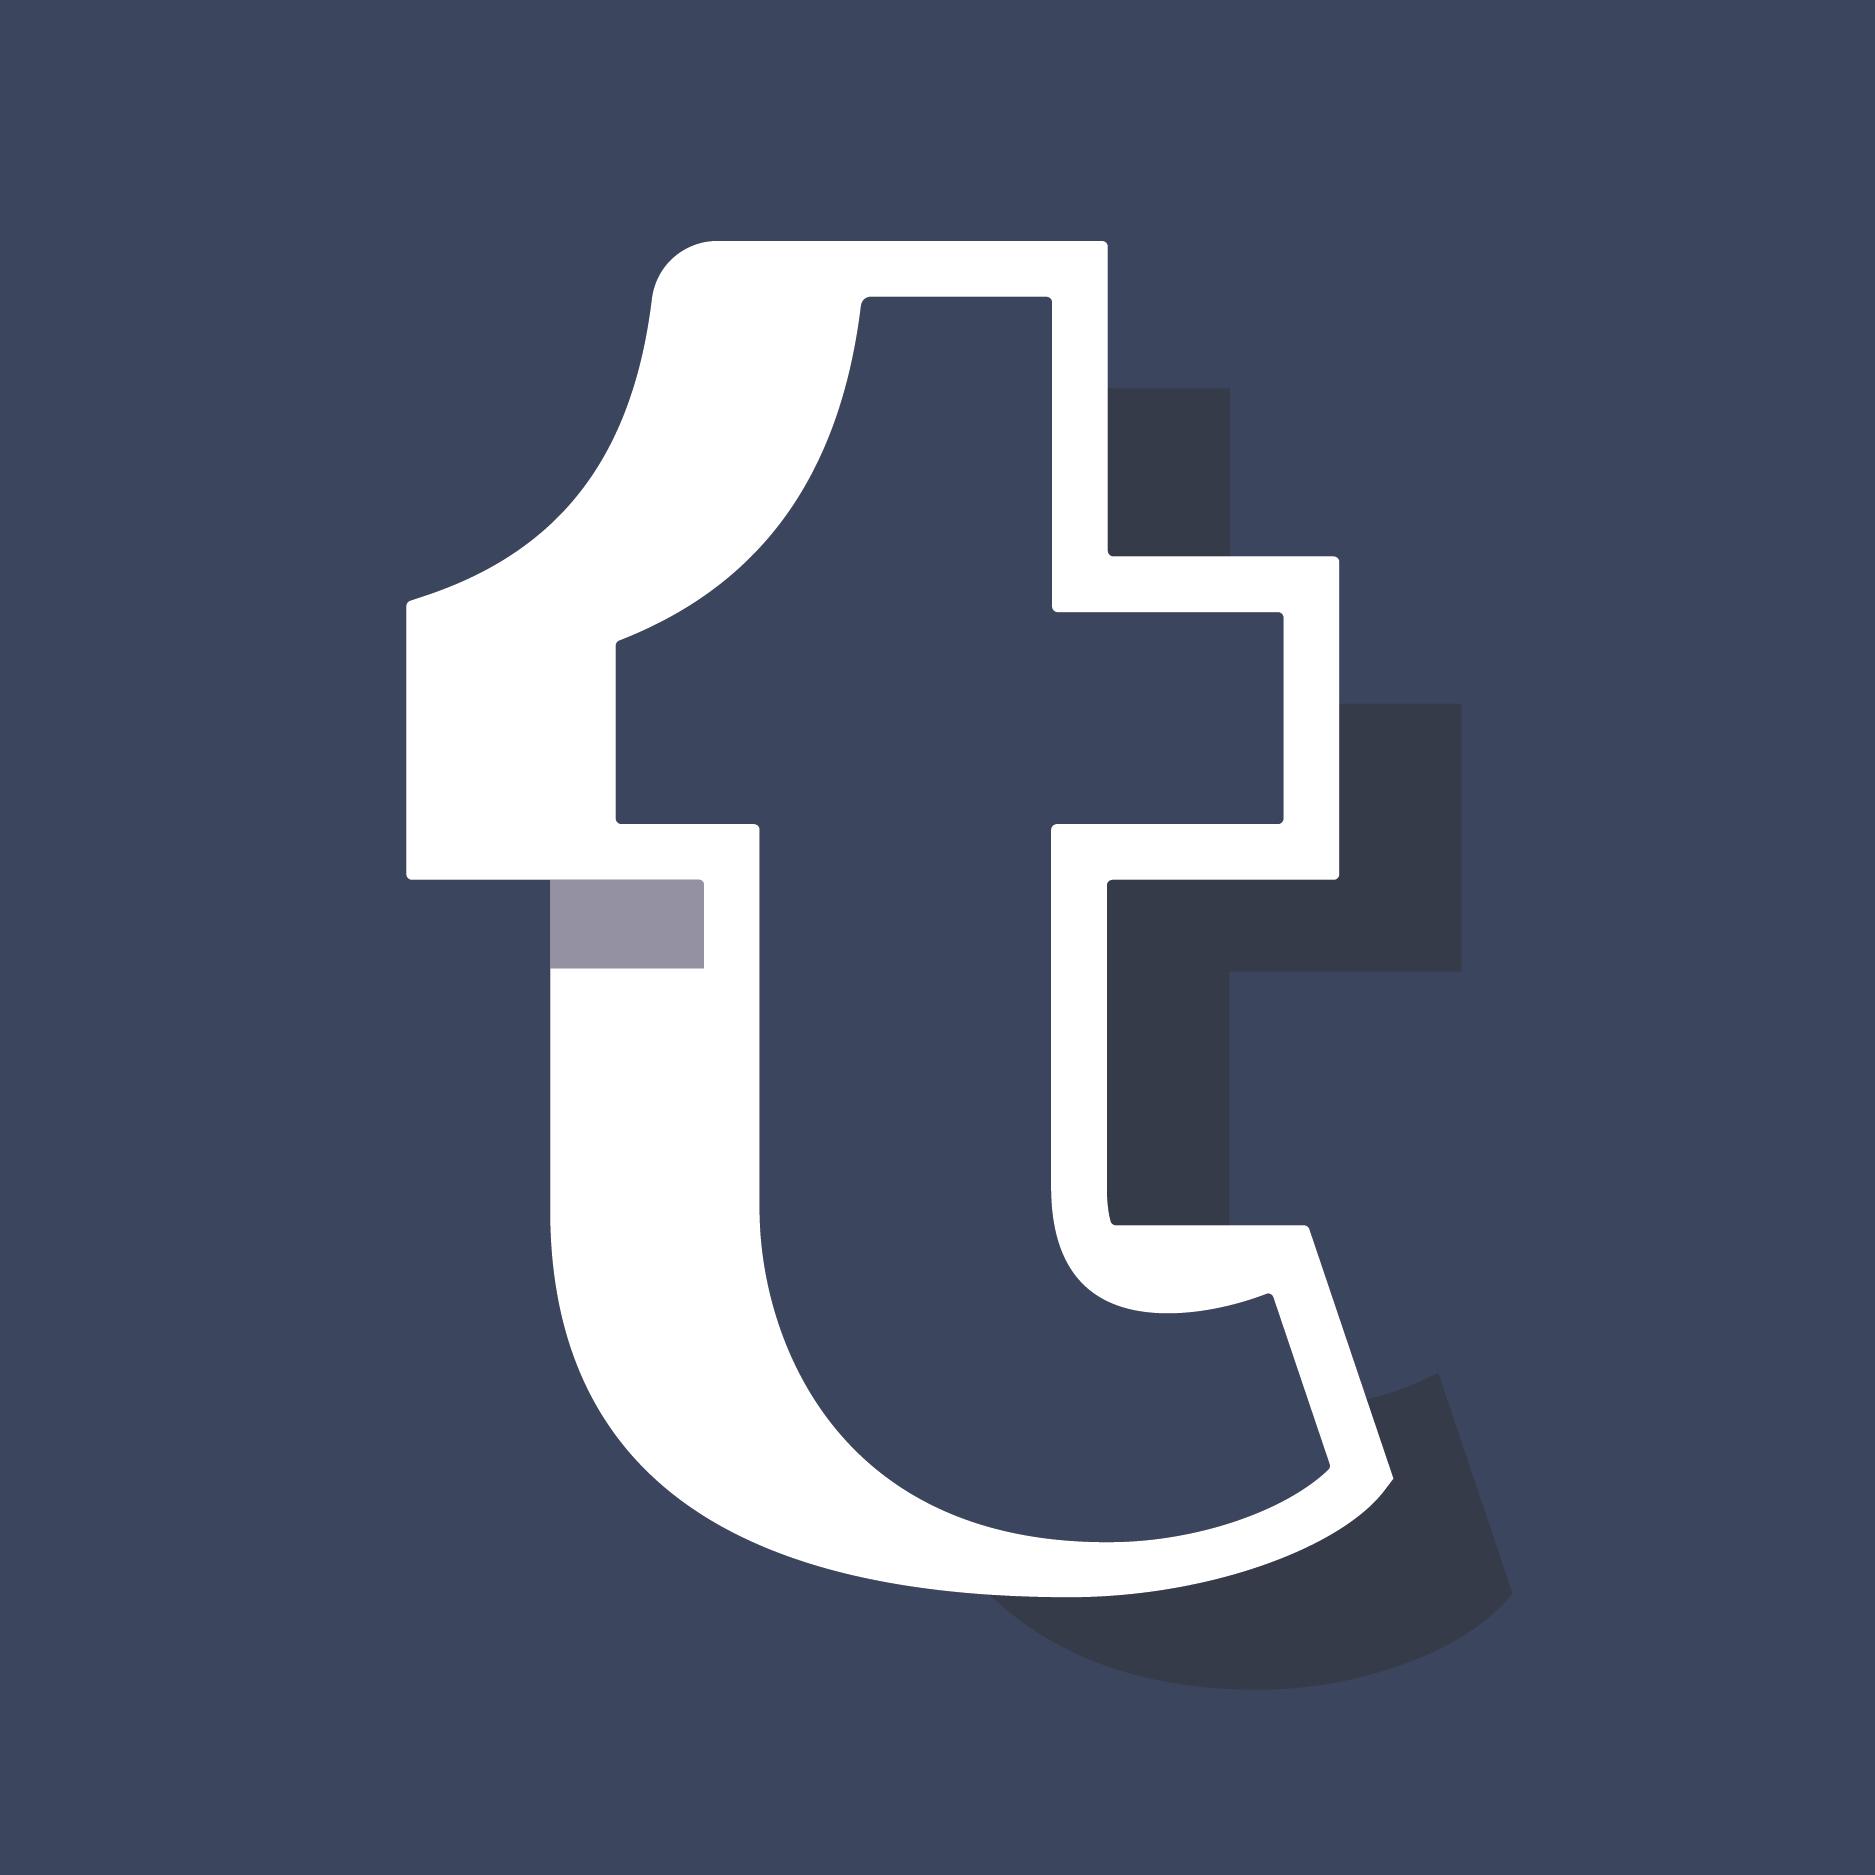 tumblr_logo_2 - Tumblr Vector PNG